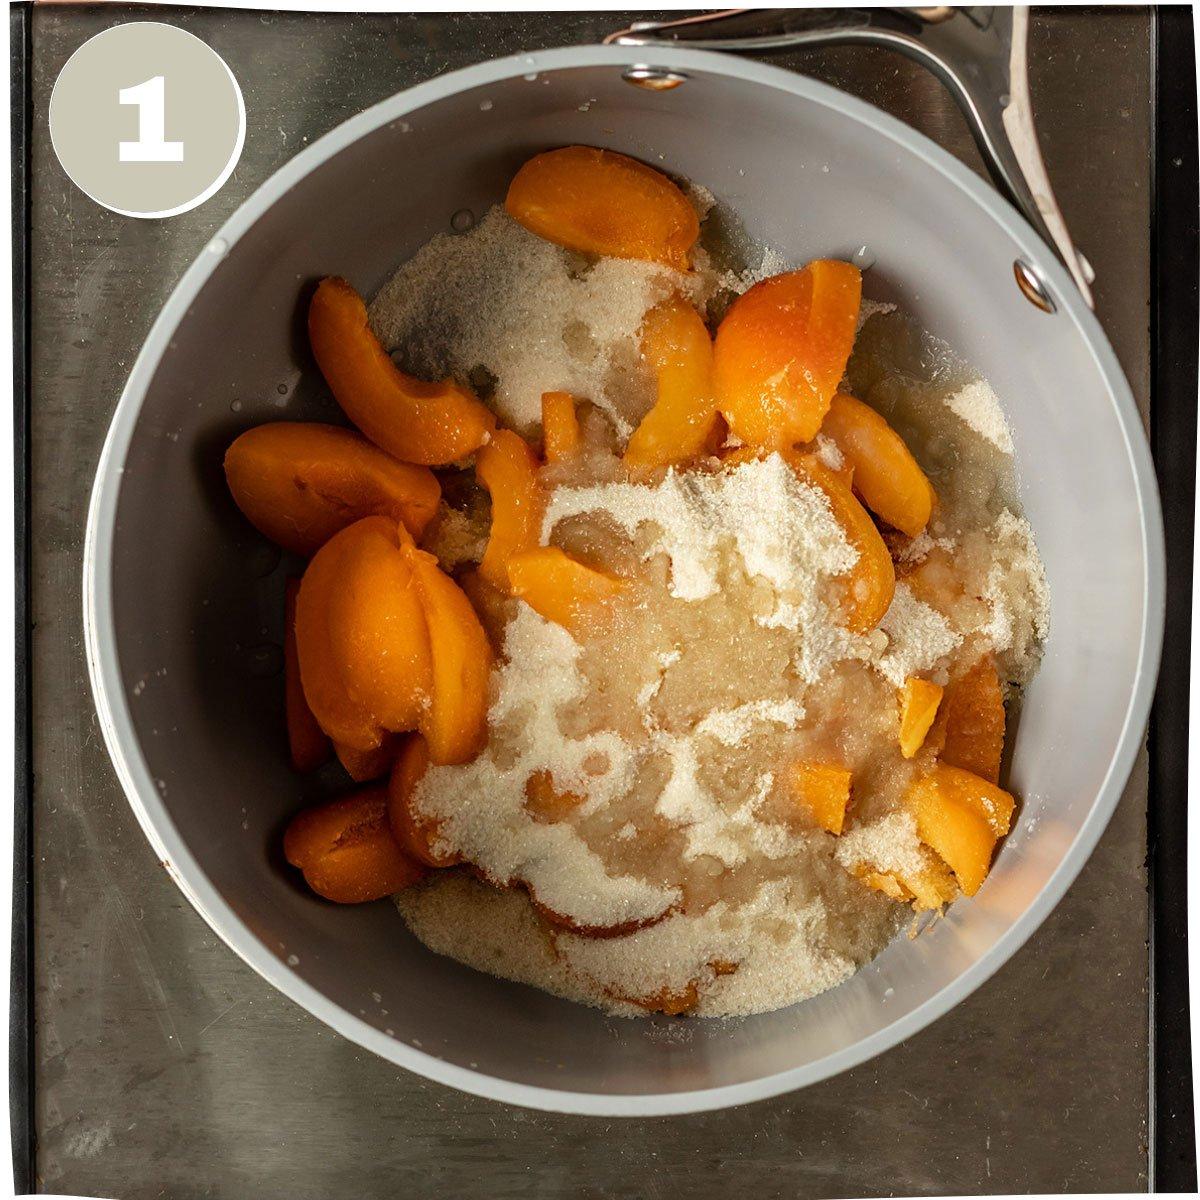 apricots, sugar, and lemon juice in a saucepan